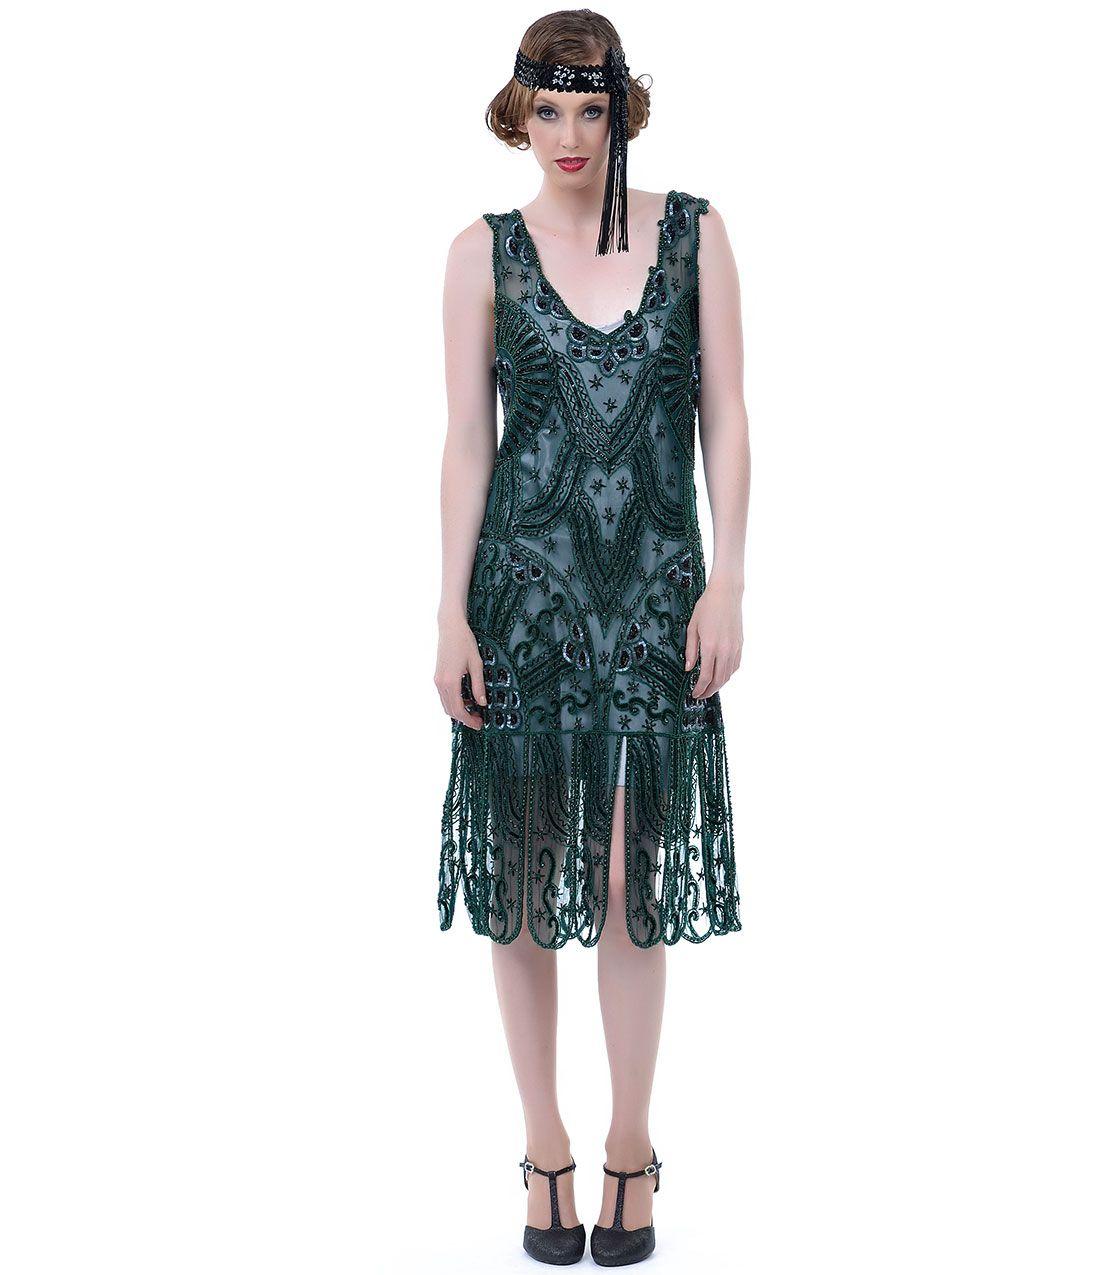 168 Stop Staring! 1930s Style Navy & Ivory Railene Dress | 1920s ...